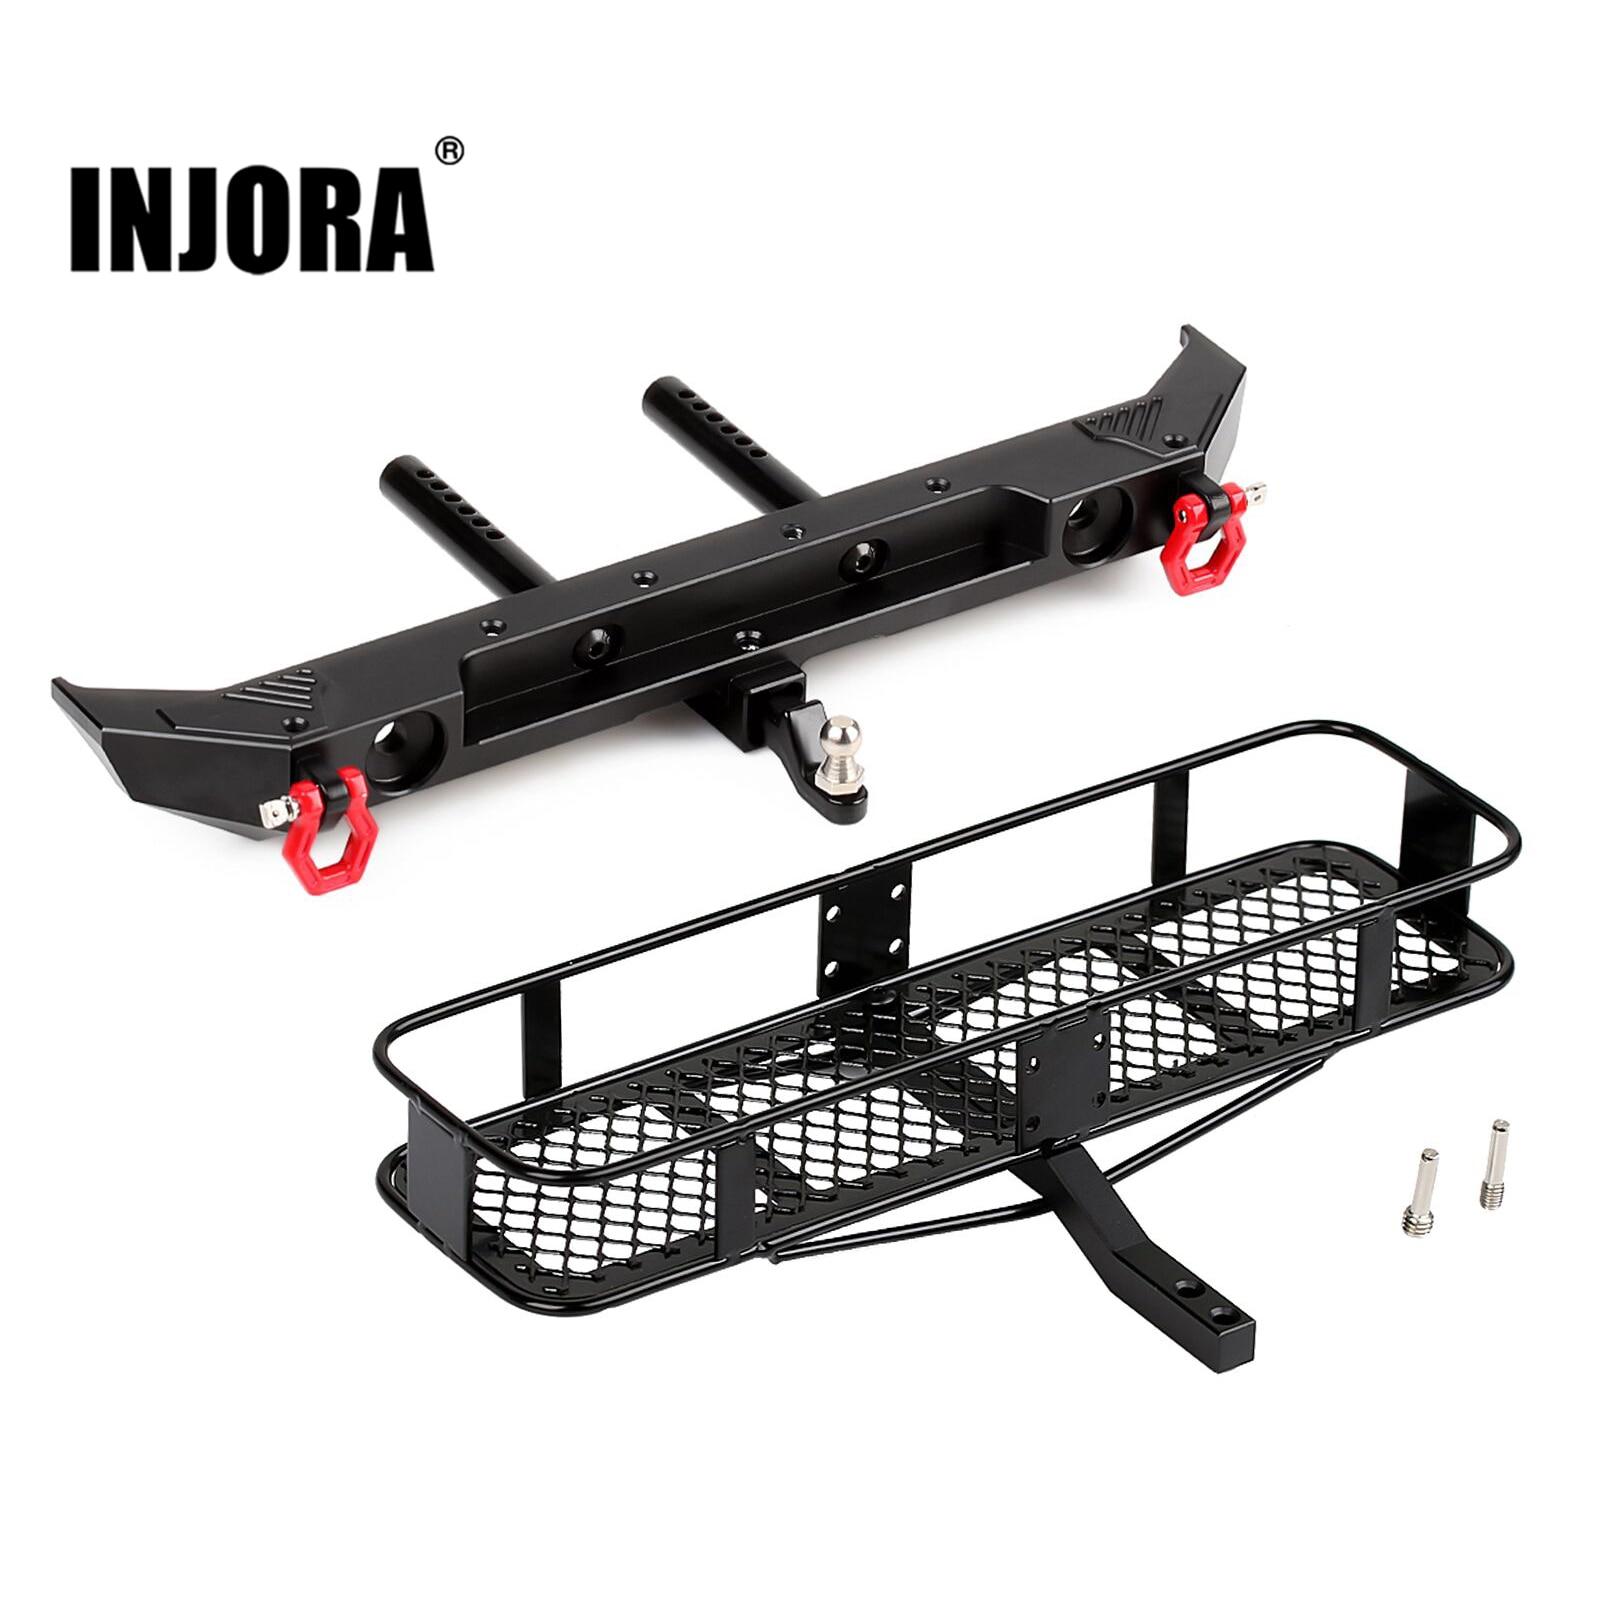 INJORA Metal Rear Bumper & Back Hitch Carrier Rack for 1/10 RC Crawler Car Axial SCX10 III AXI03007 Upgrade Parts